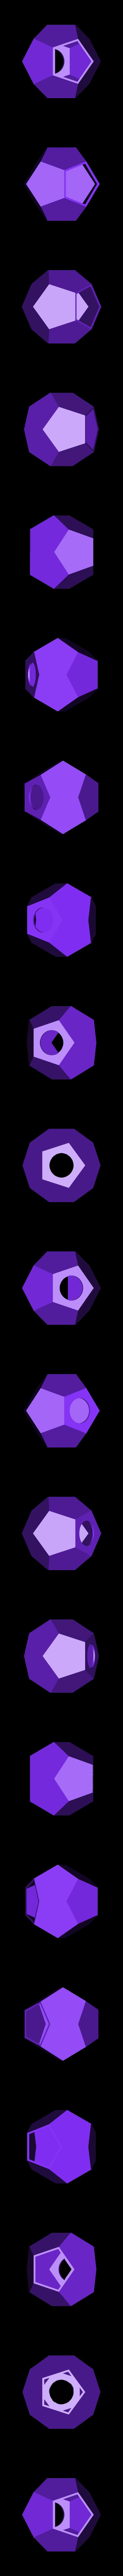 UM2_dodecaedro1.stl Download free STL file Dodecahedron light • Model to 3D print, AlbertFarres